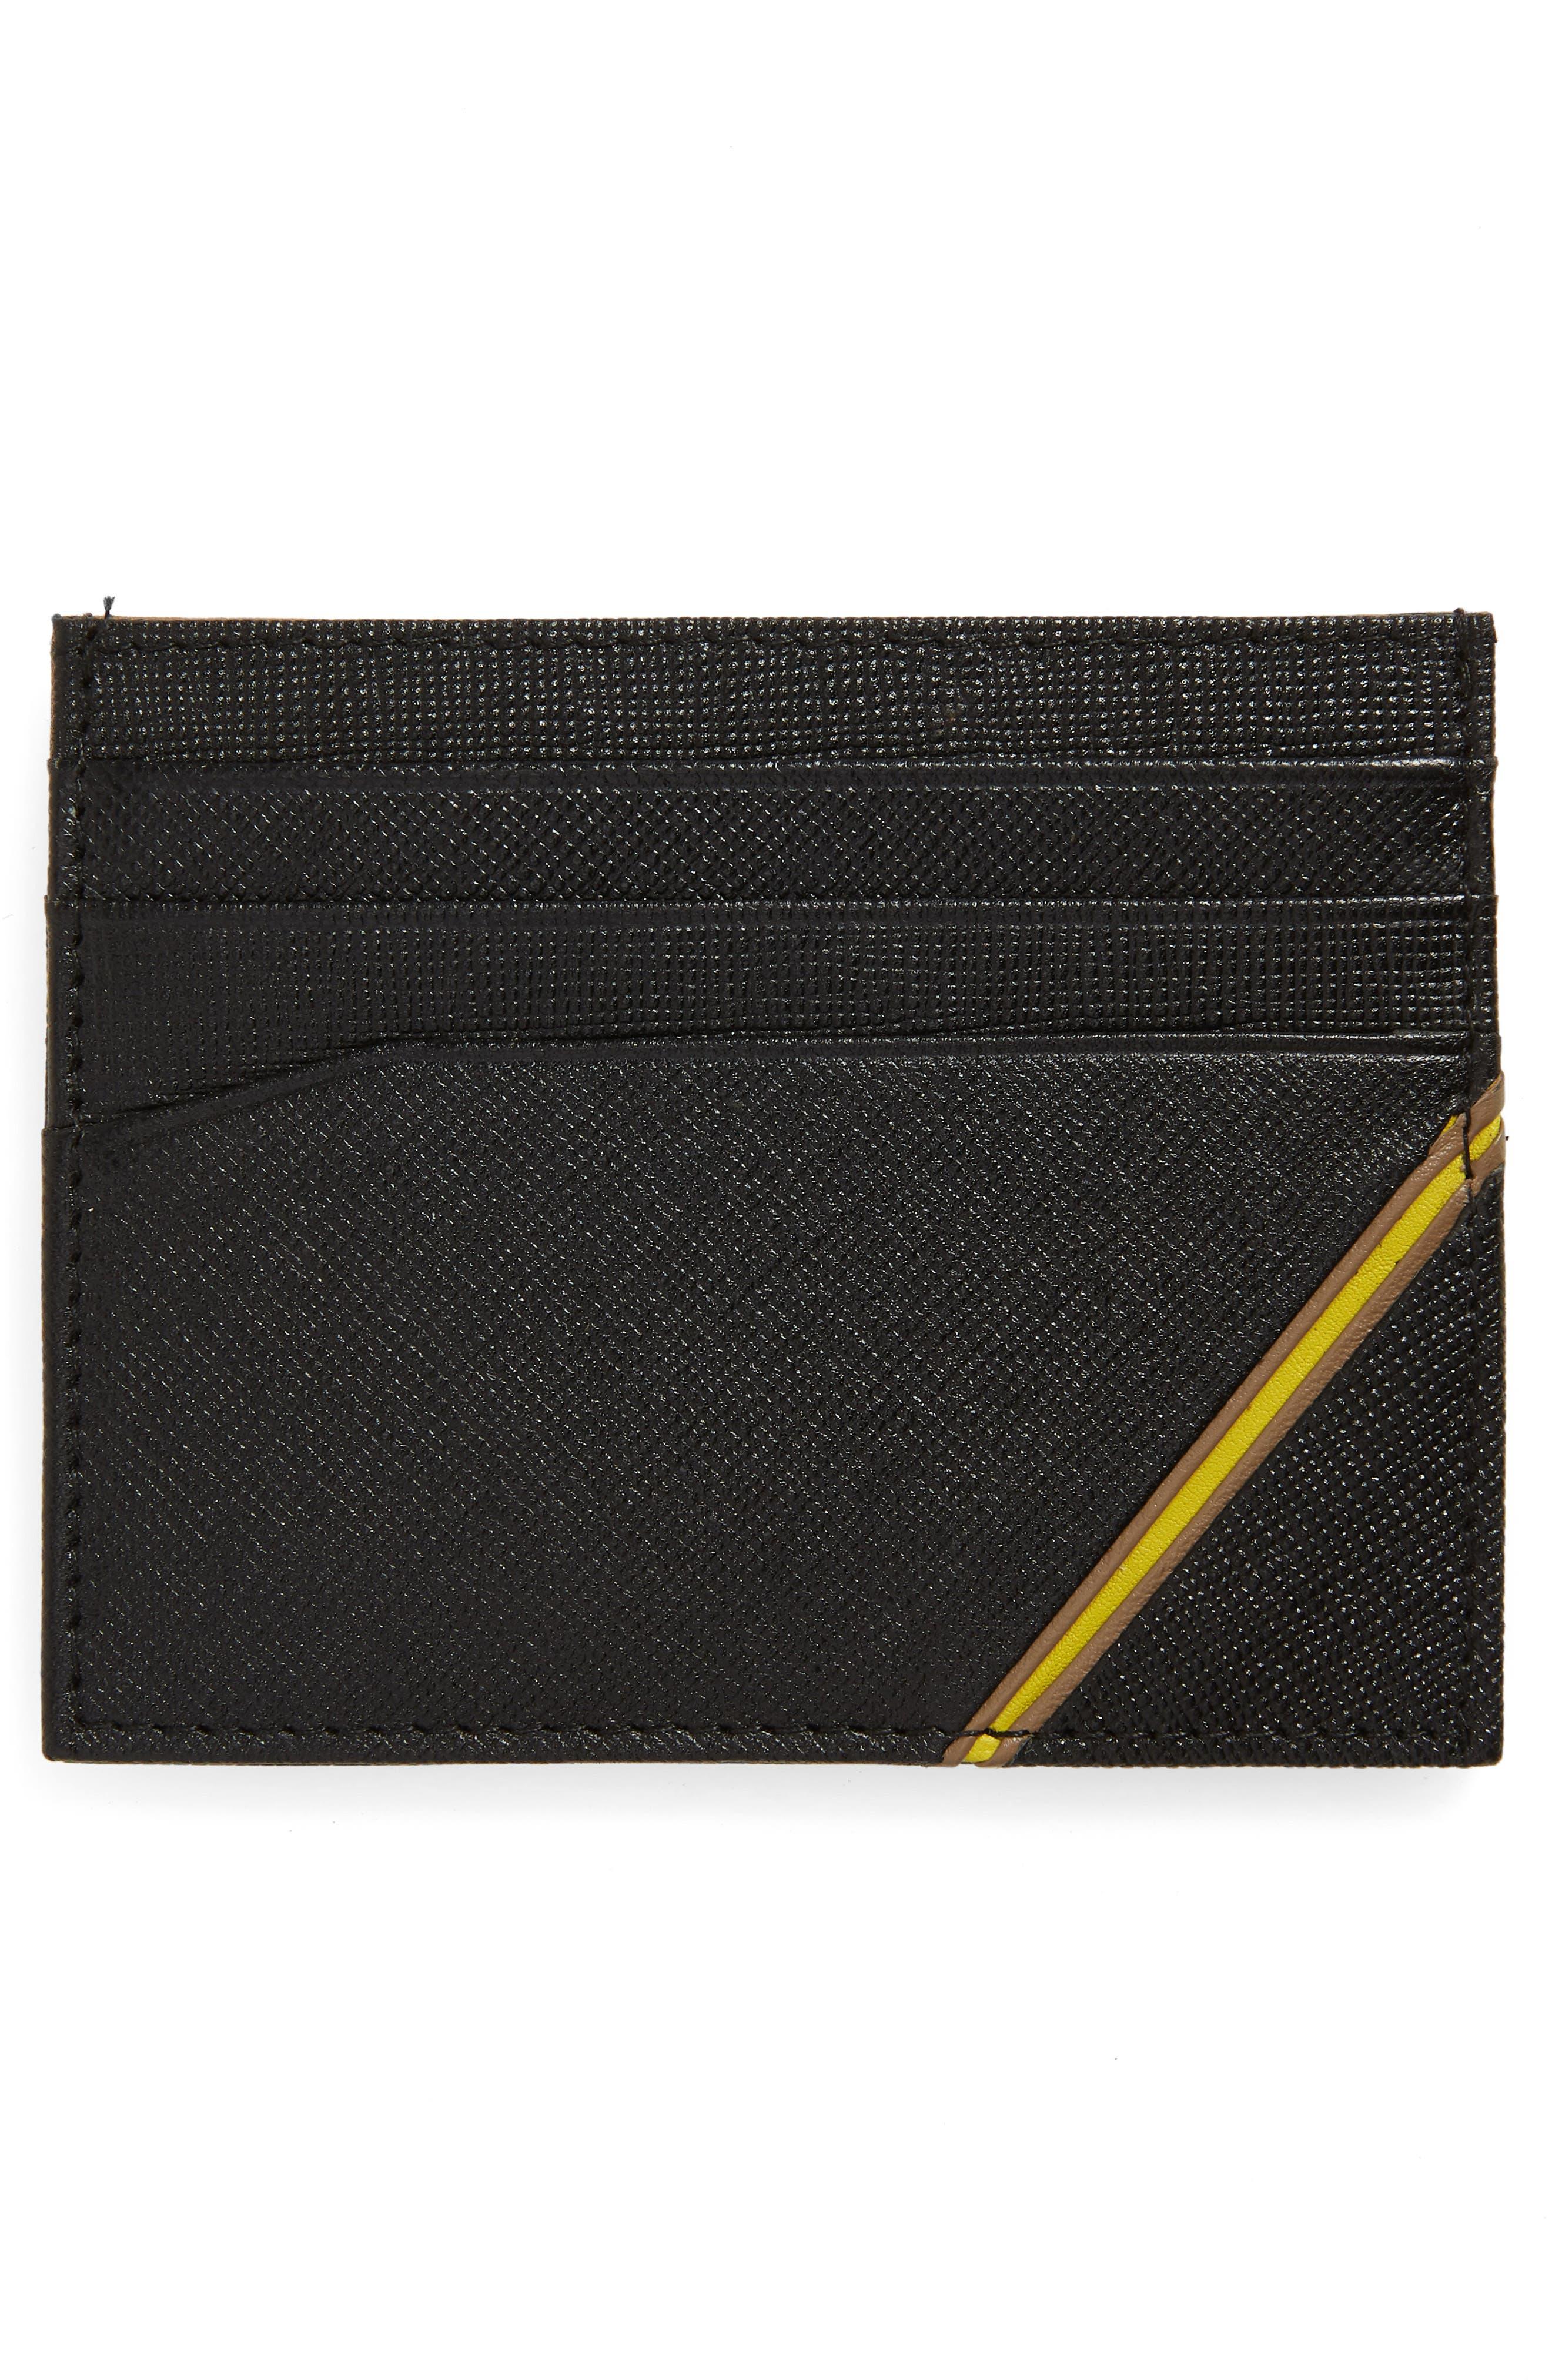 Stripe Leather Card Case,                             Alternate thumbnail 2, color,                             BLACK